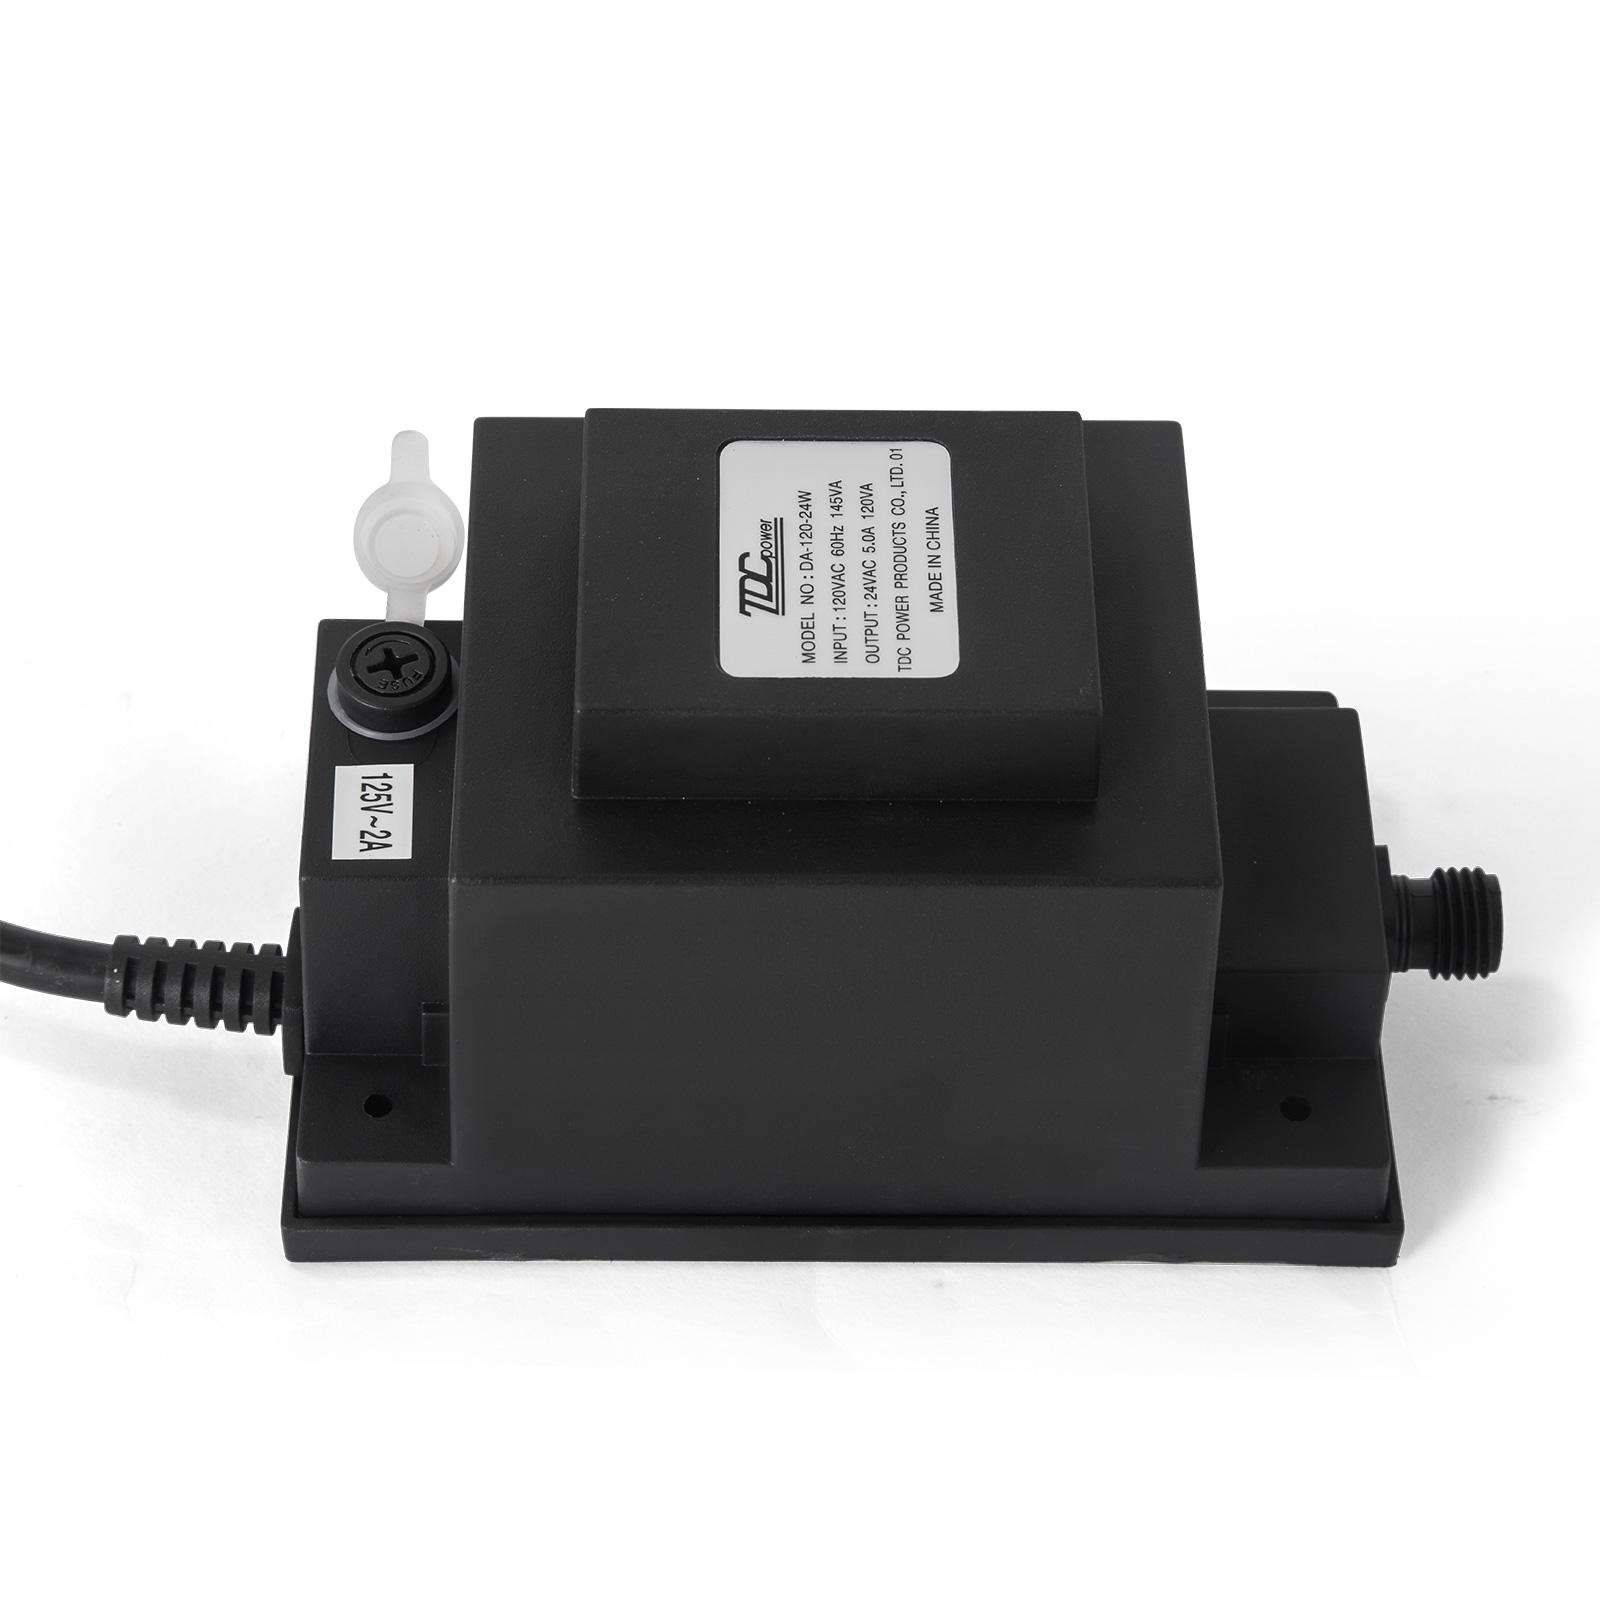 Product Description 5 head Ultrasonic Mist Maker